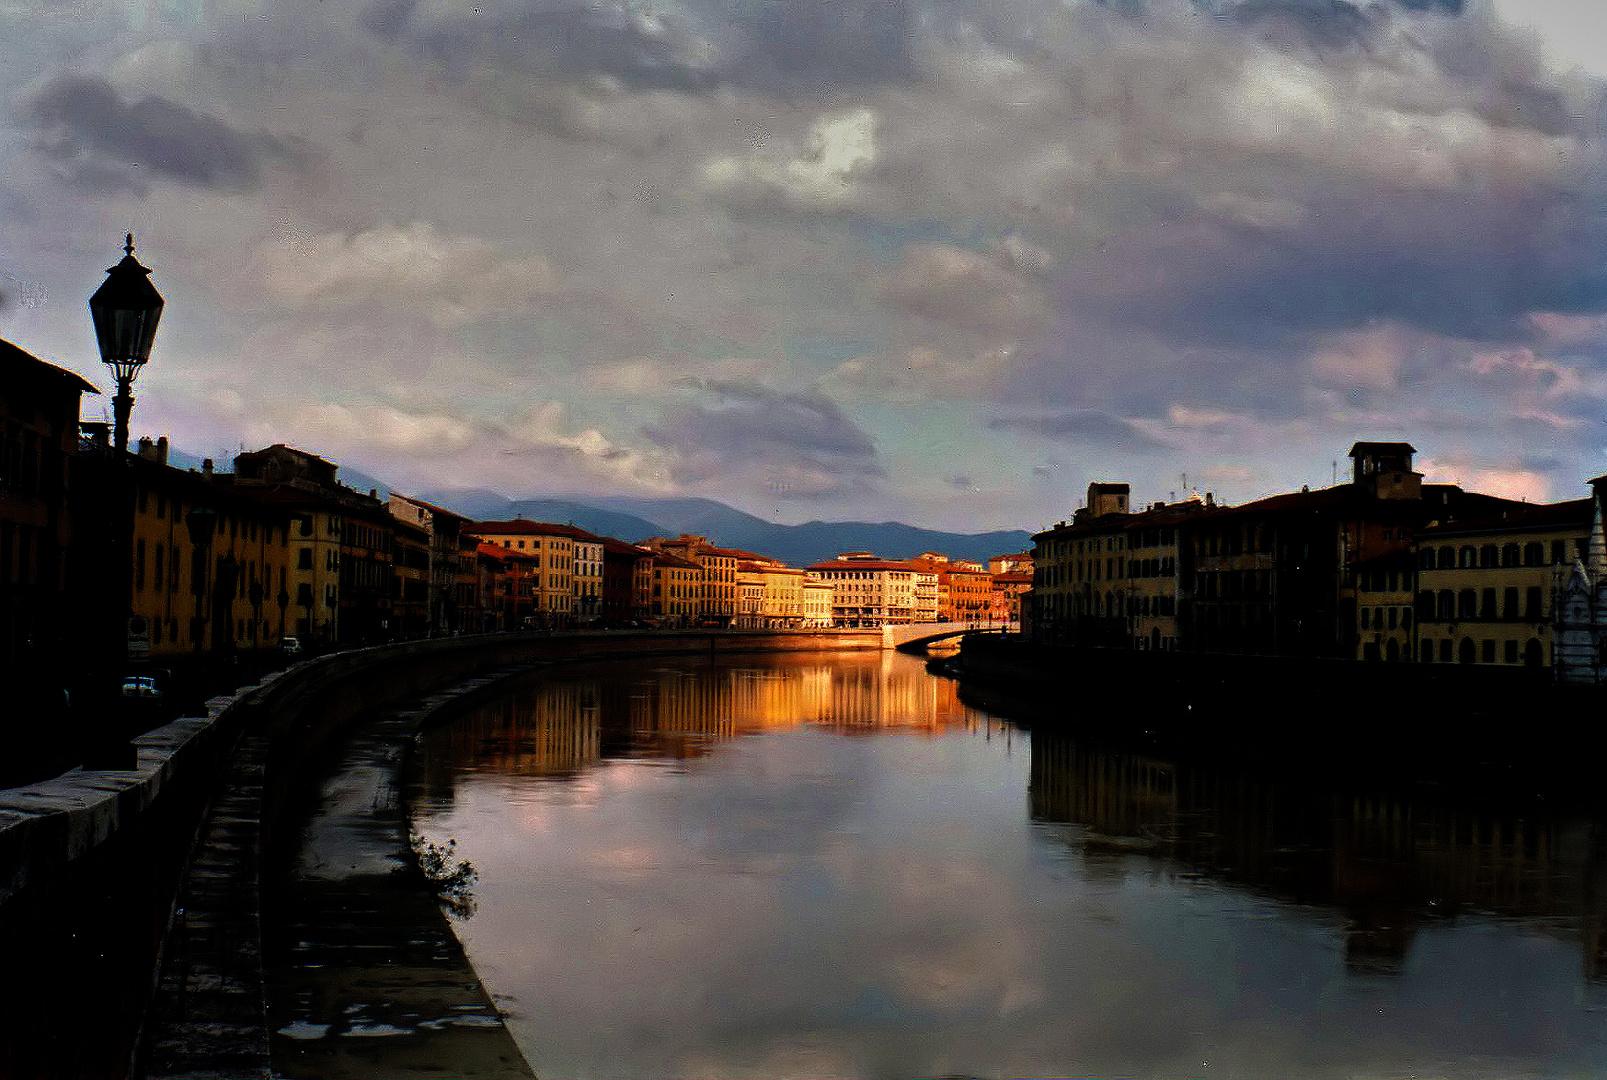 PISA - LUNGARNO SUNSET